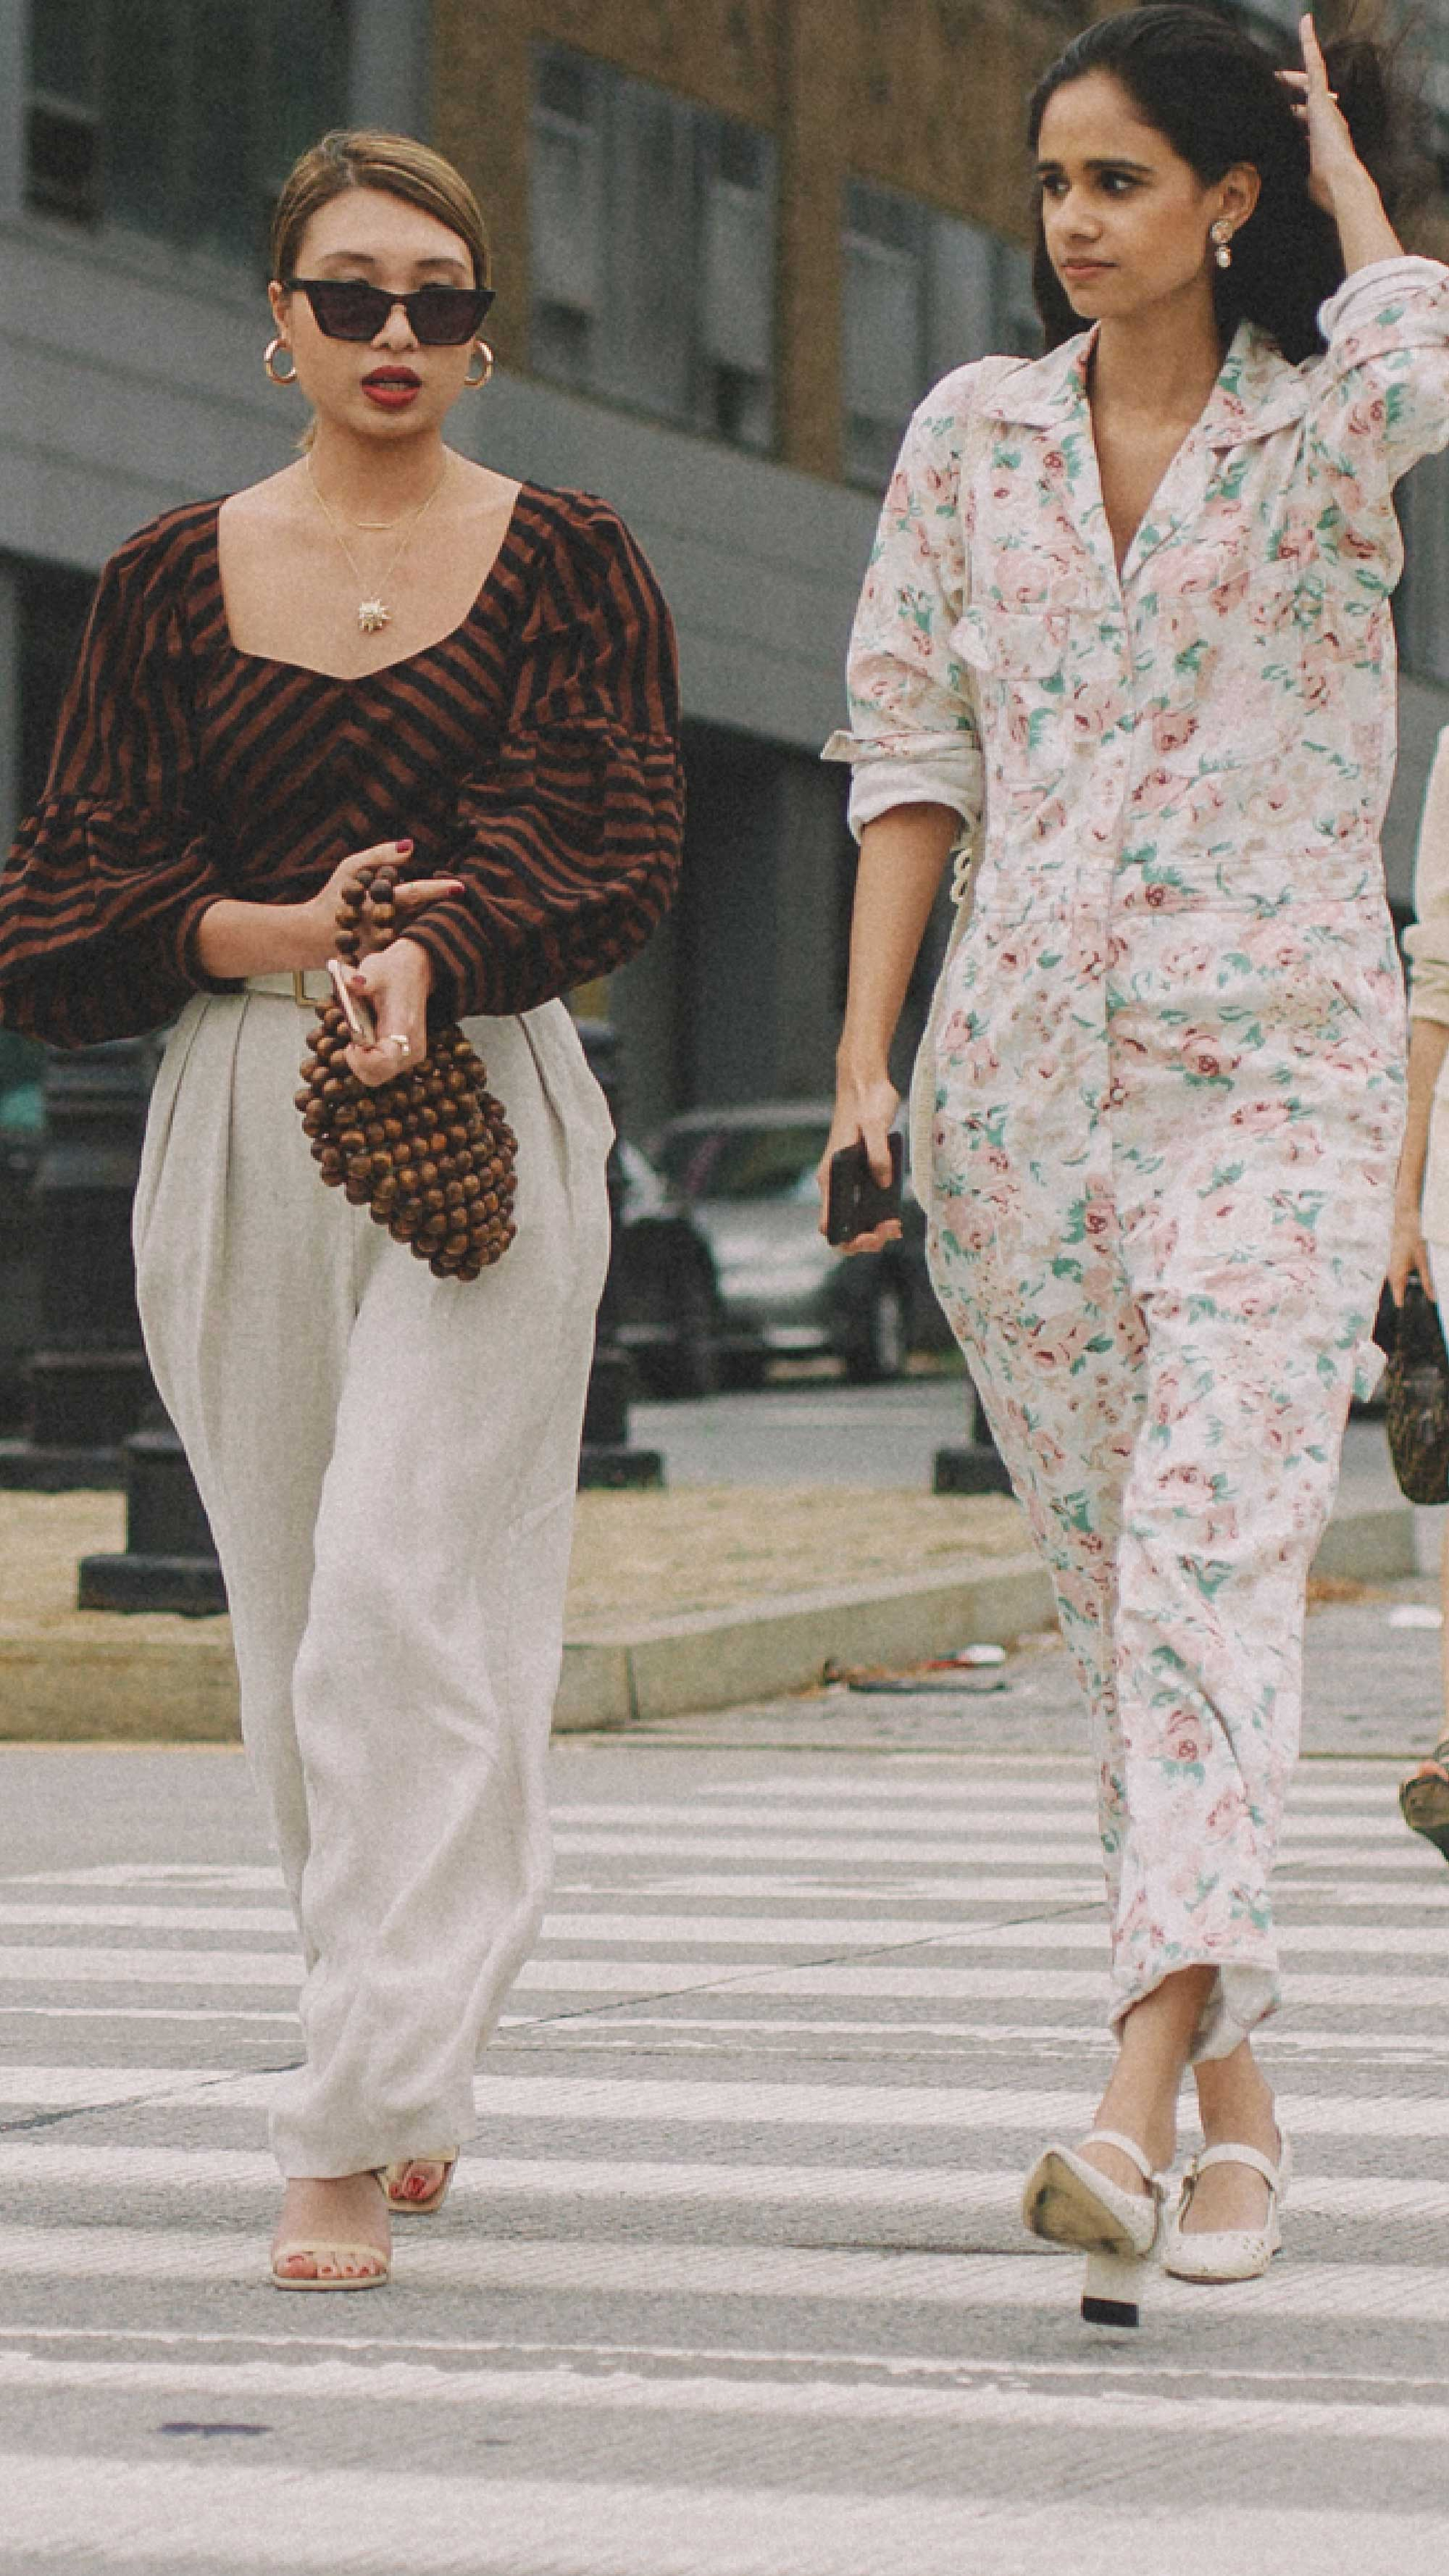 New-York-Fashion-Week-NYFW-SS18-street-style-day-five-SS18-20.jpg